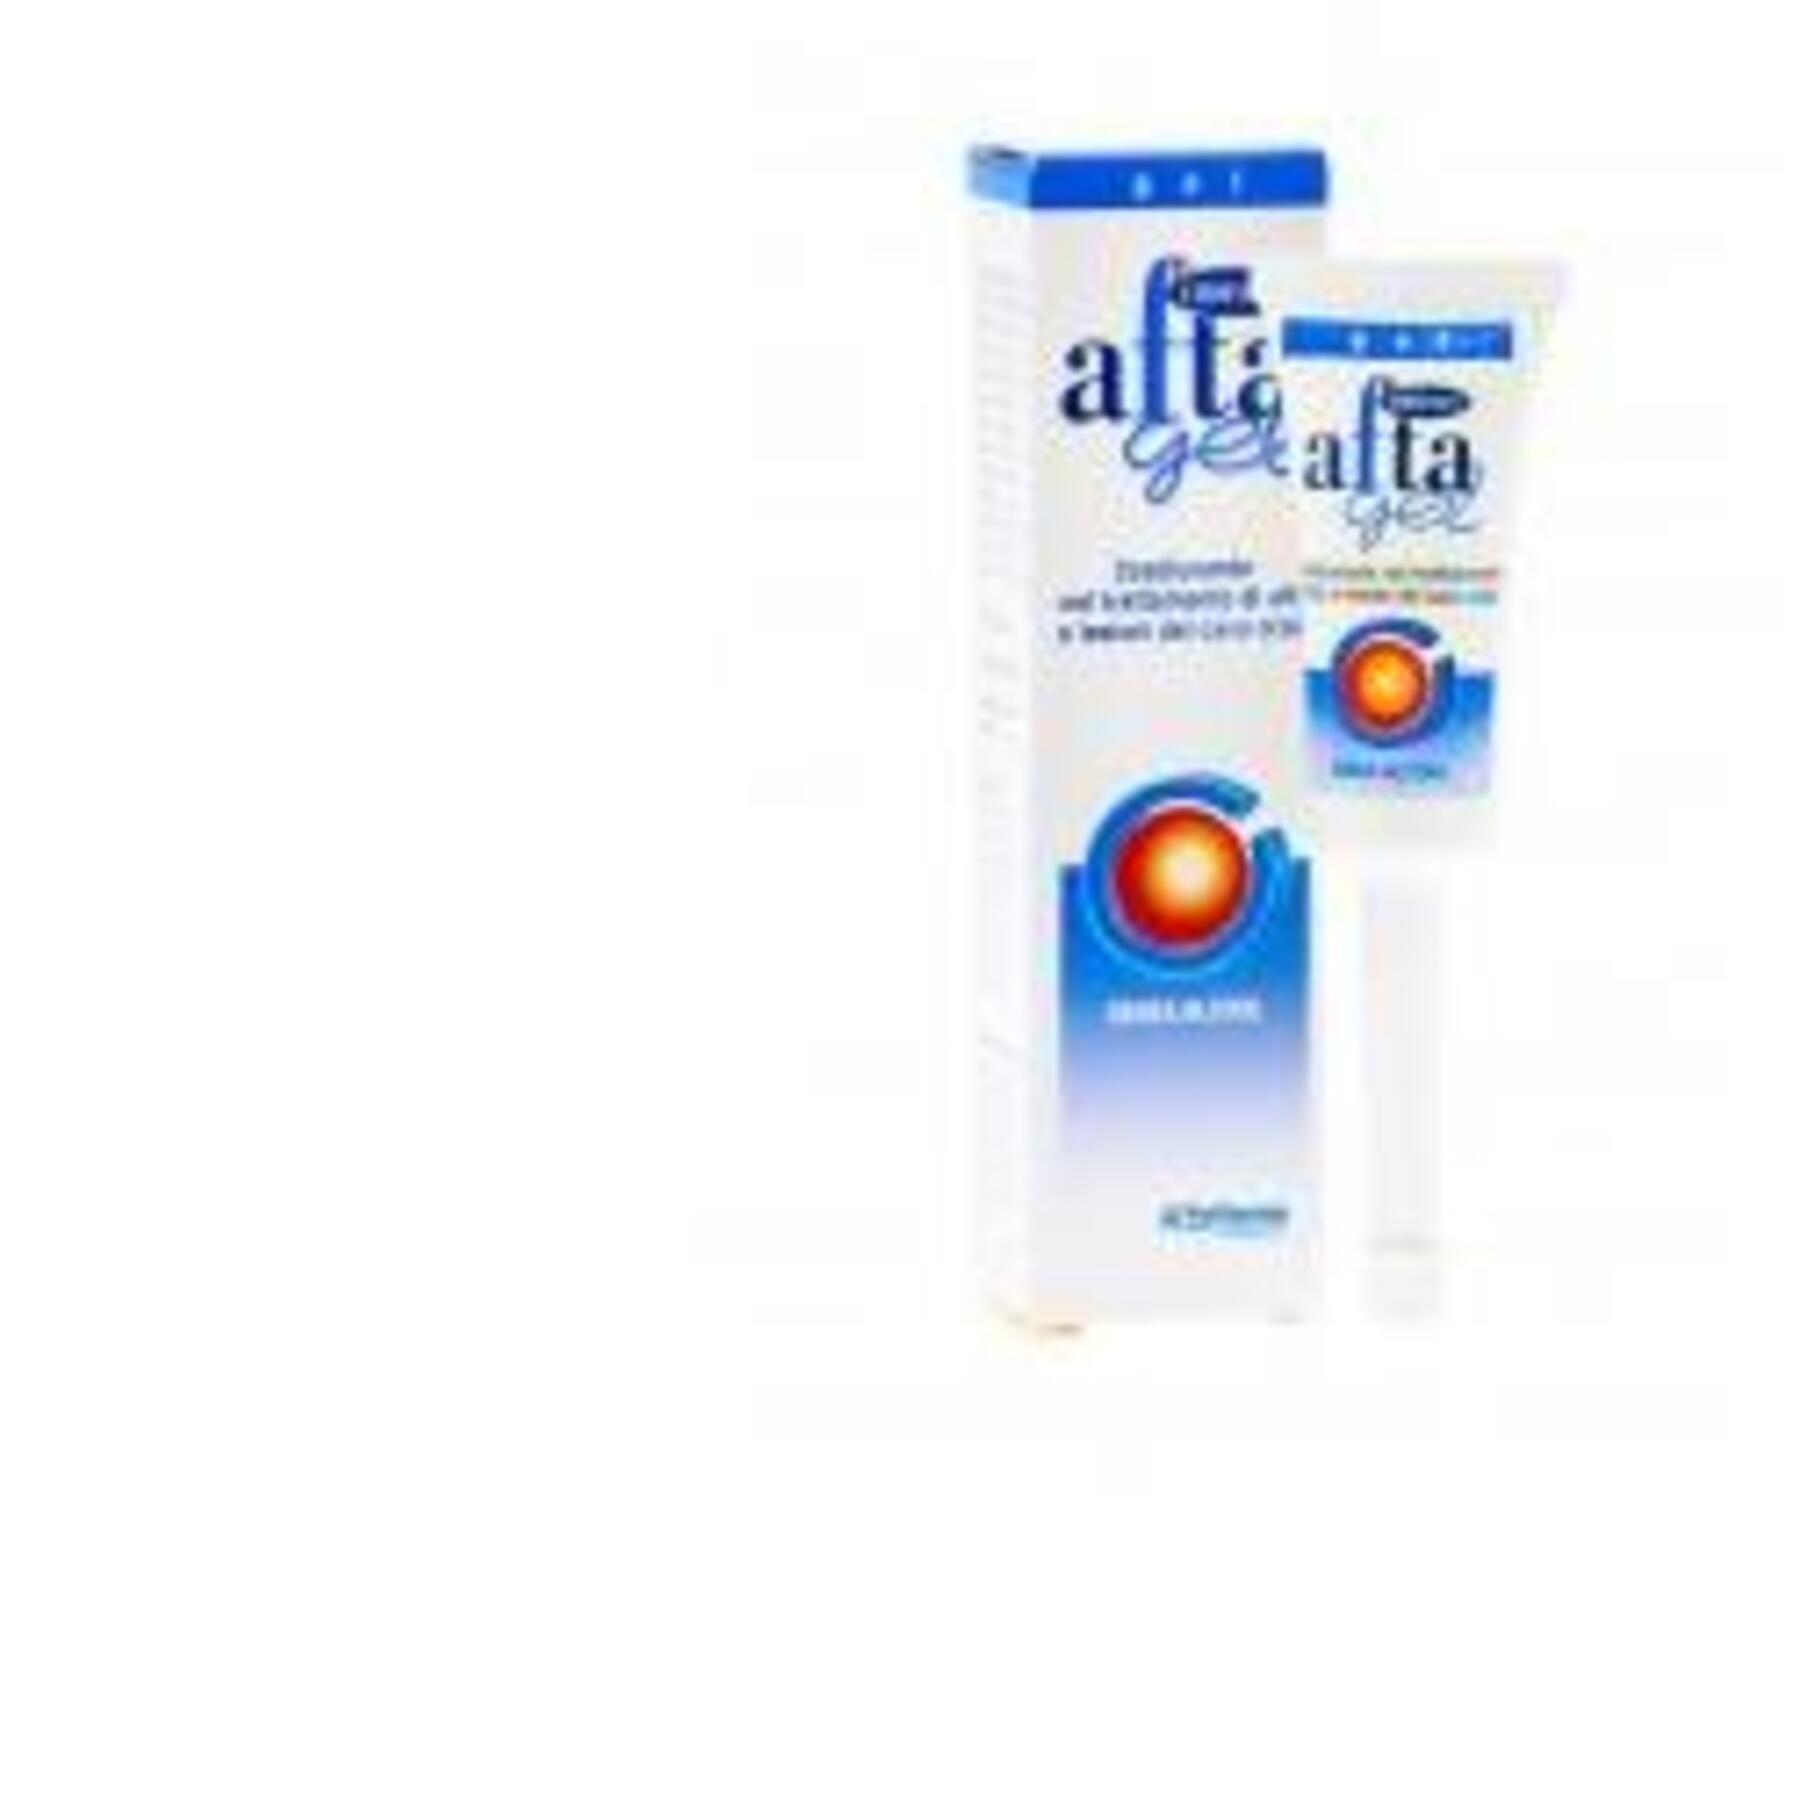 polifarma benessere srl emoform aftagel gel per igiene dentale 8ml*